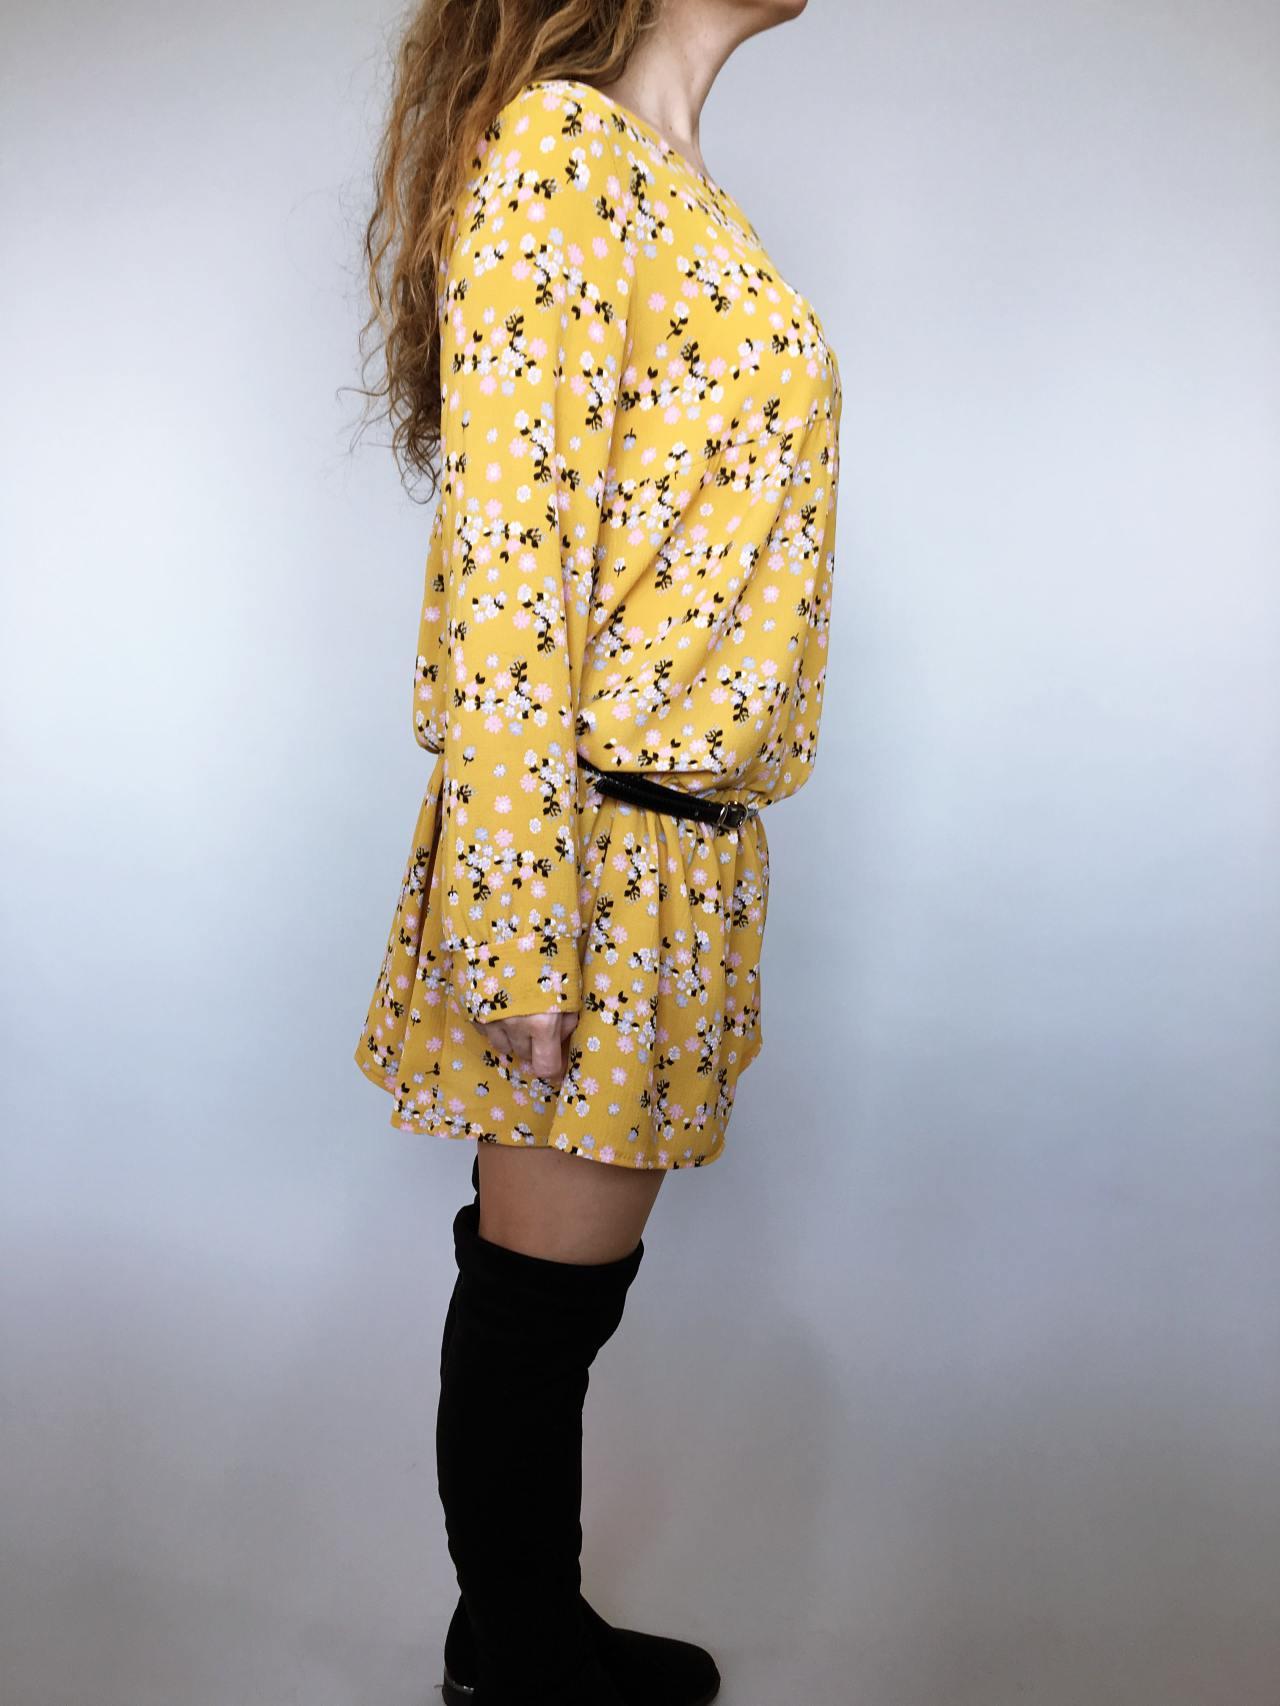 Šaty Lucy žluté 03